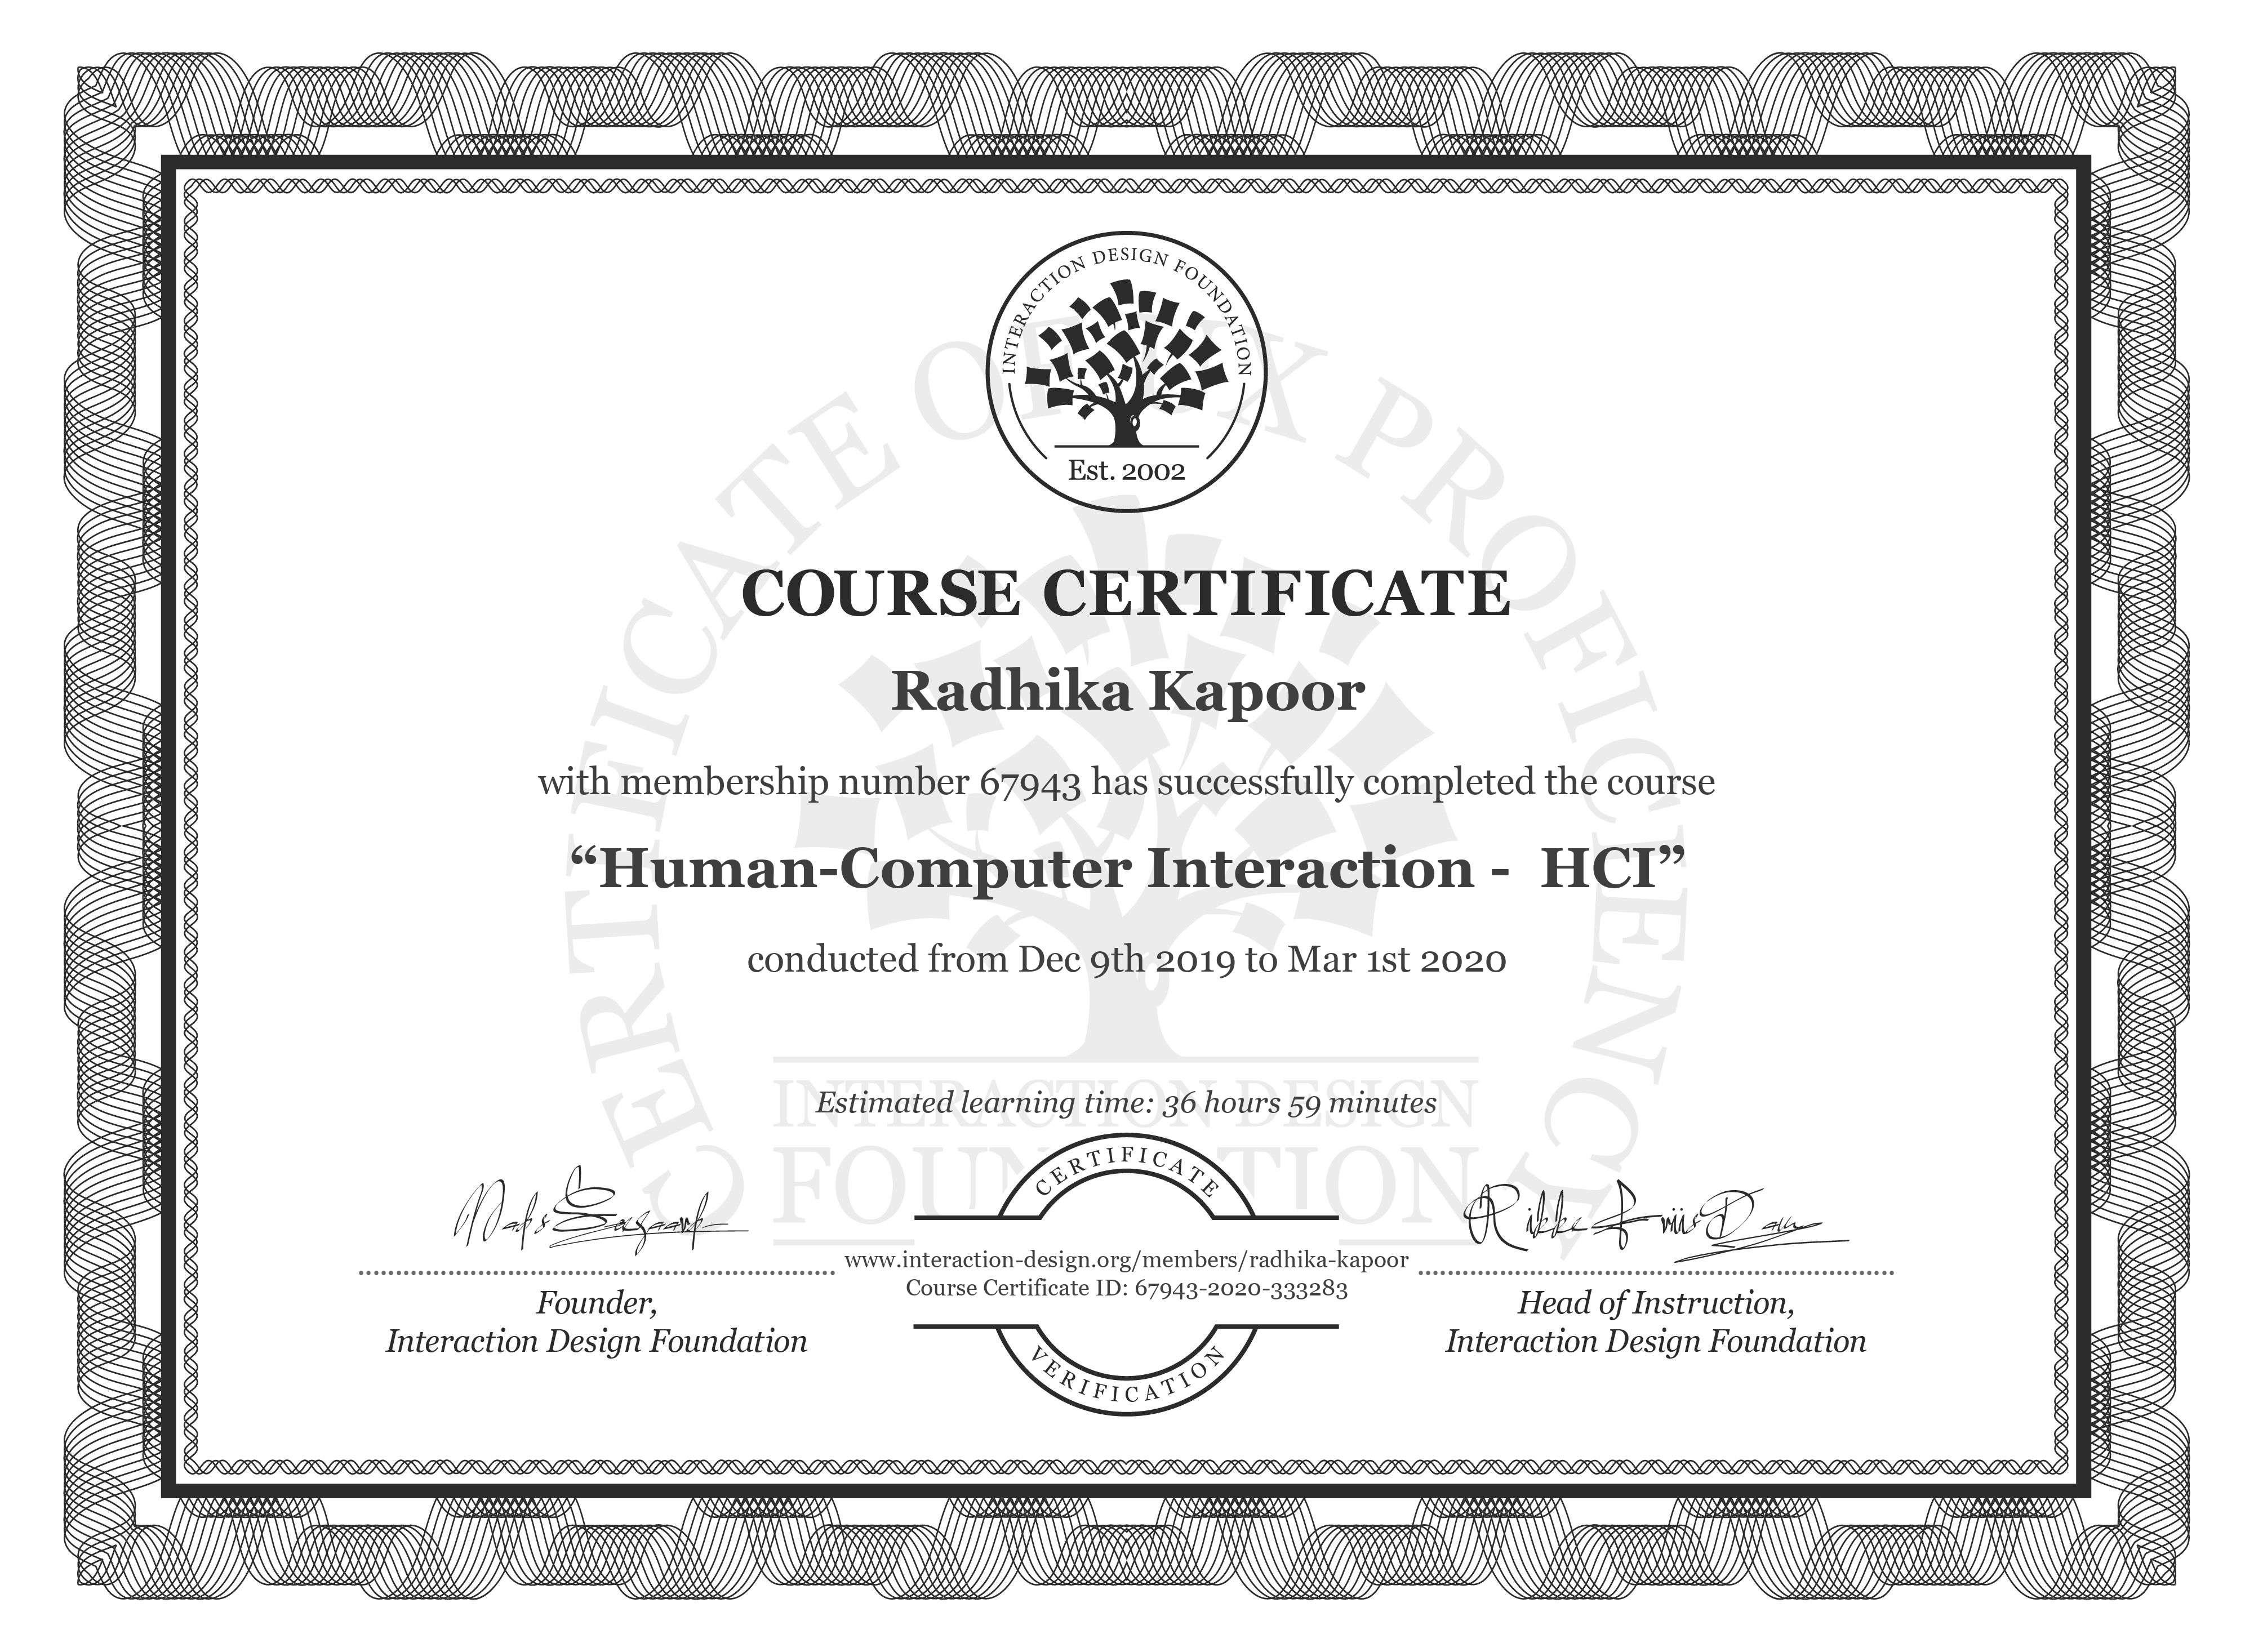 Radhika Kapoor's Course Certificate: Human-Computer Interaction -  HCI